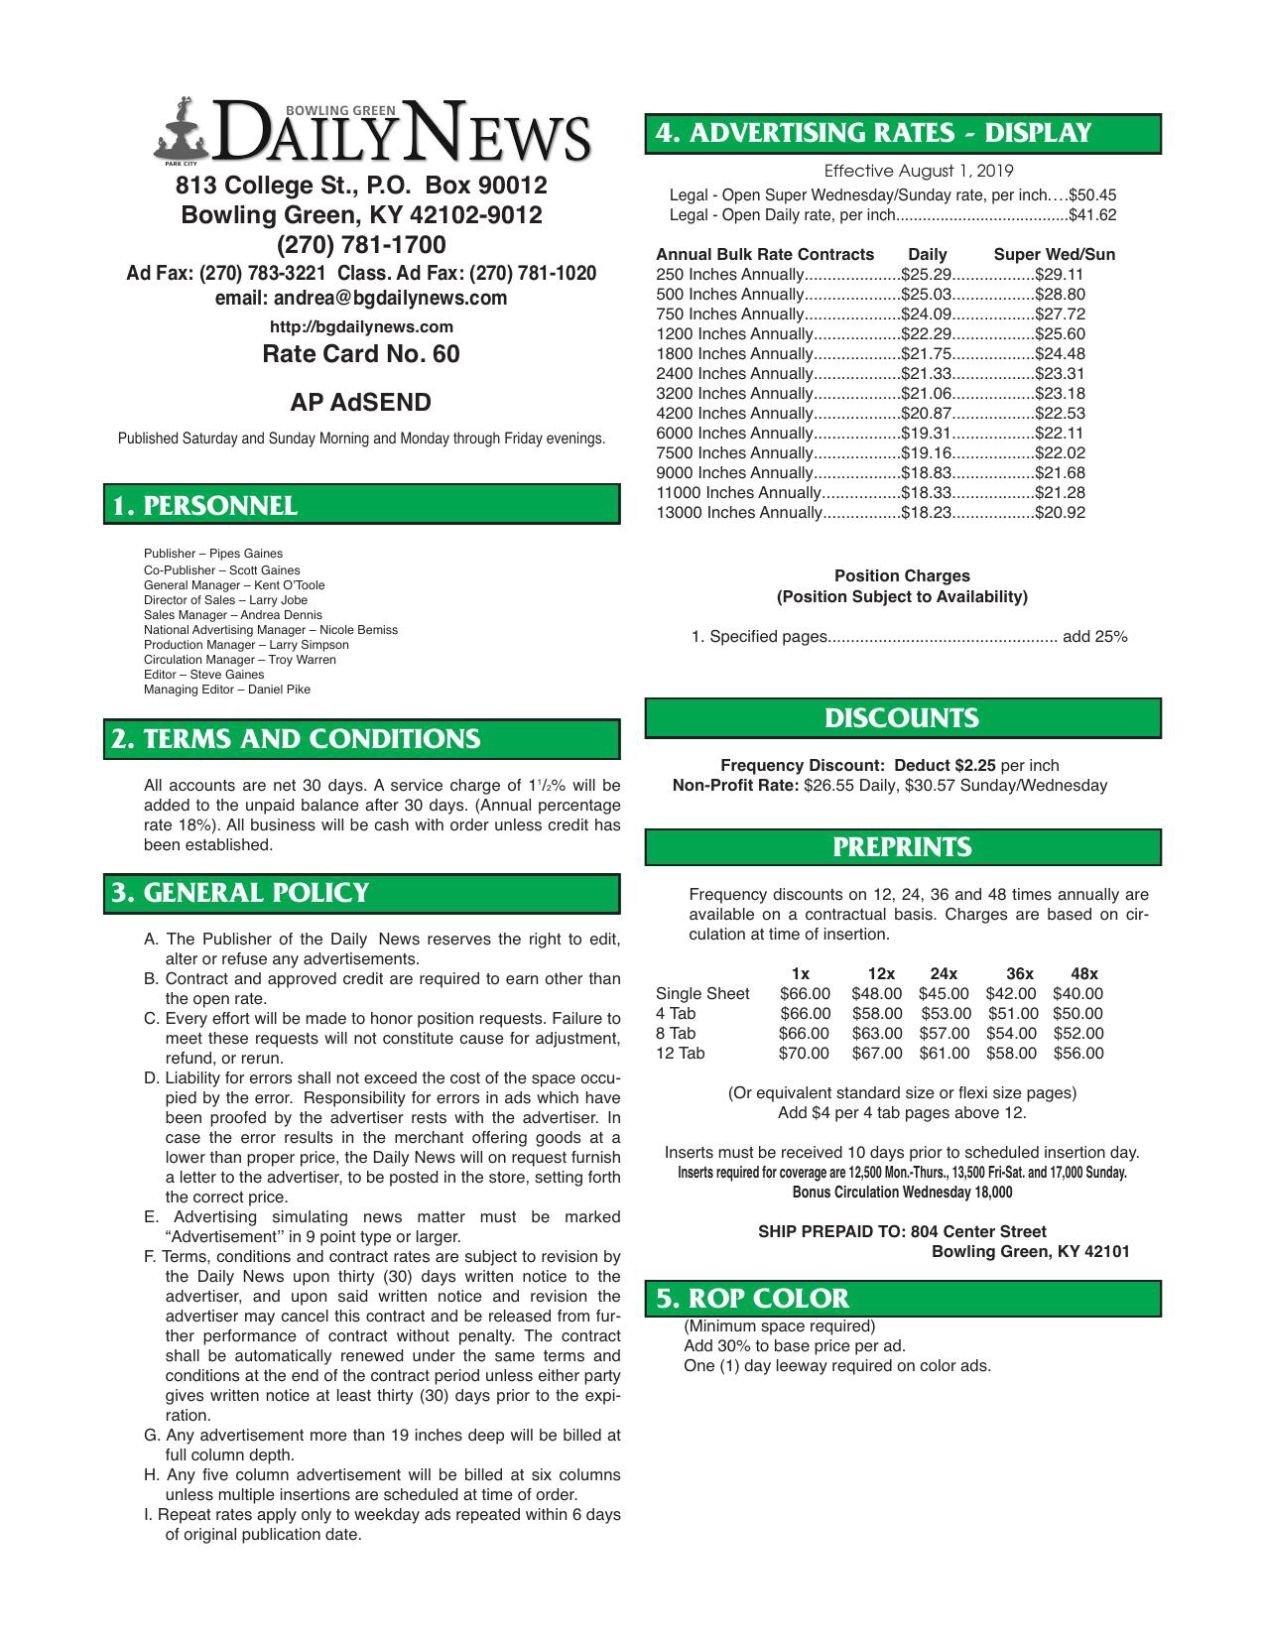 DN Local Print Rate Card